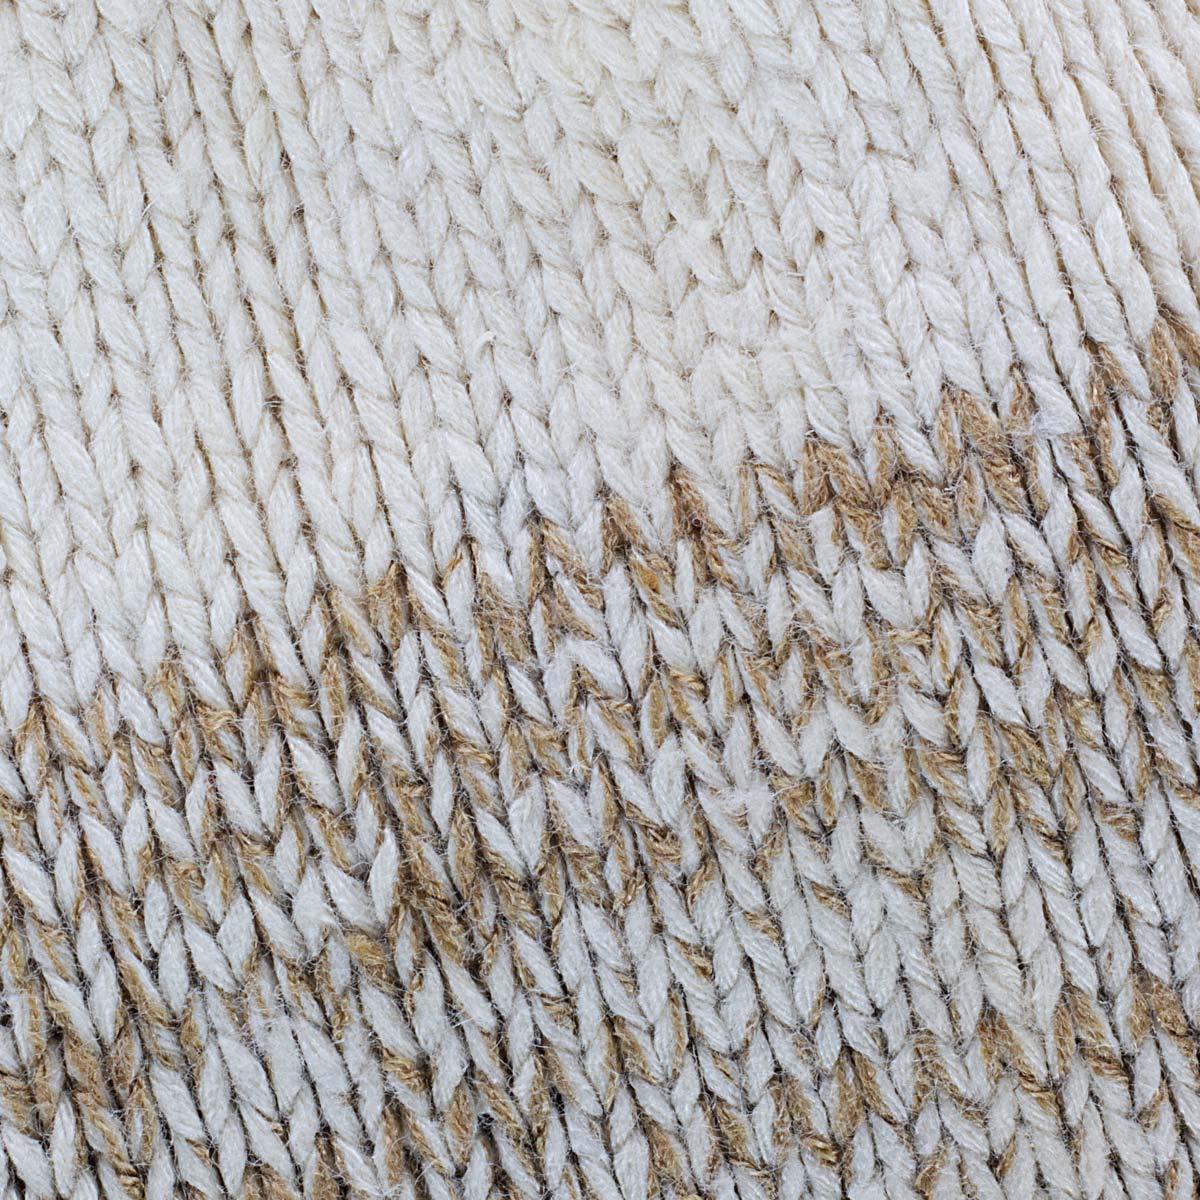 Handmade Knitted Eri /& Muga Natural Color Muezart 100/% Natural Eri and Muga Silk Blended Unisex Beanie Hat